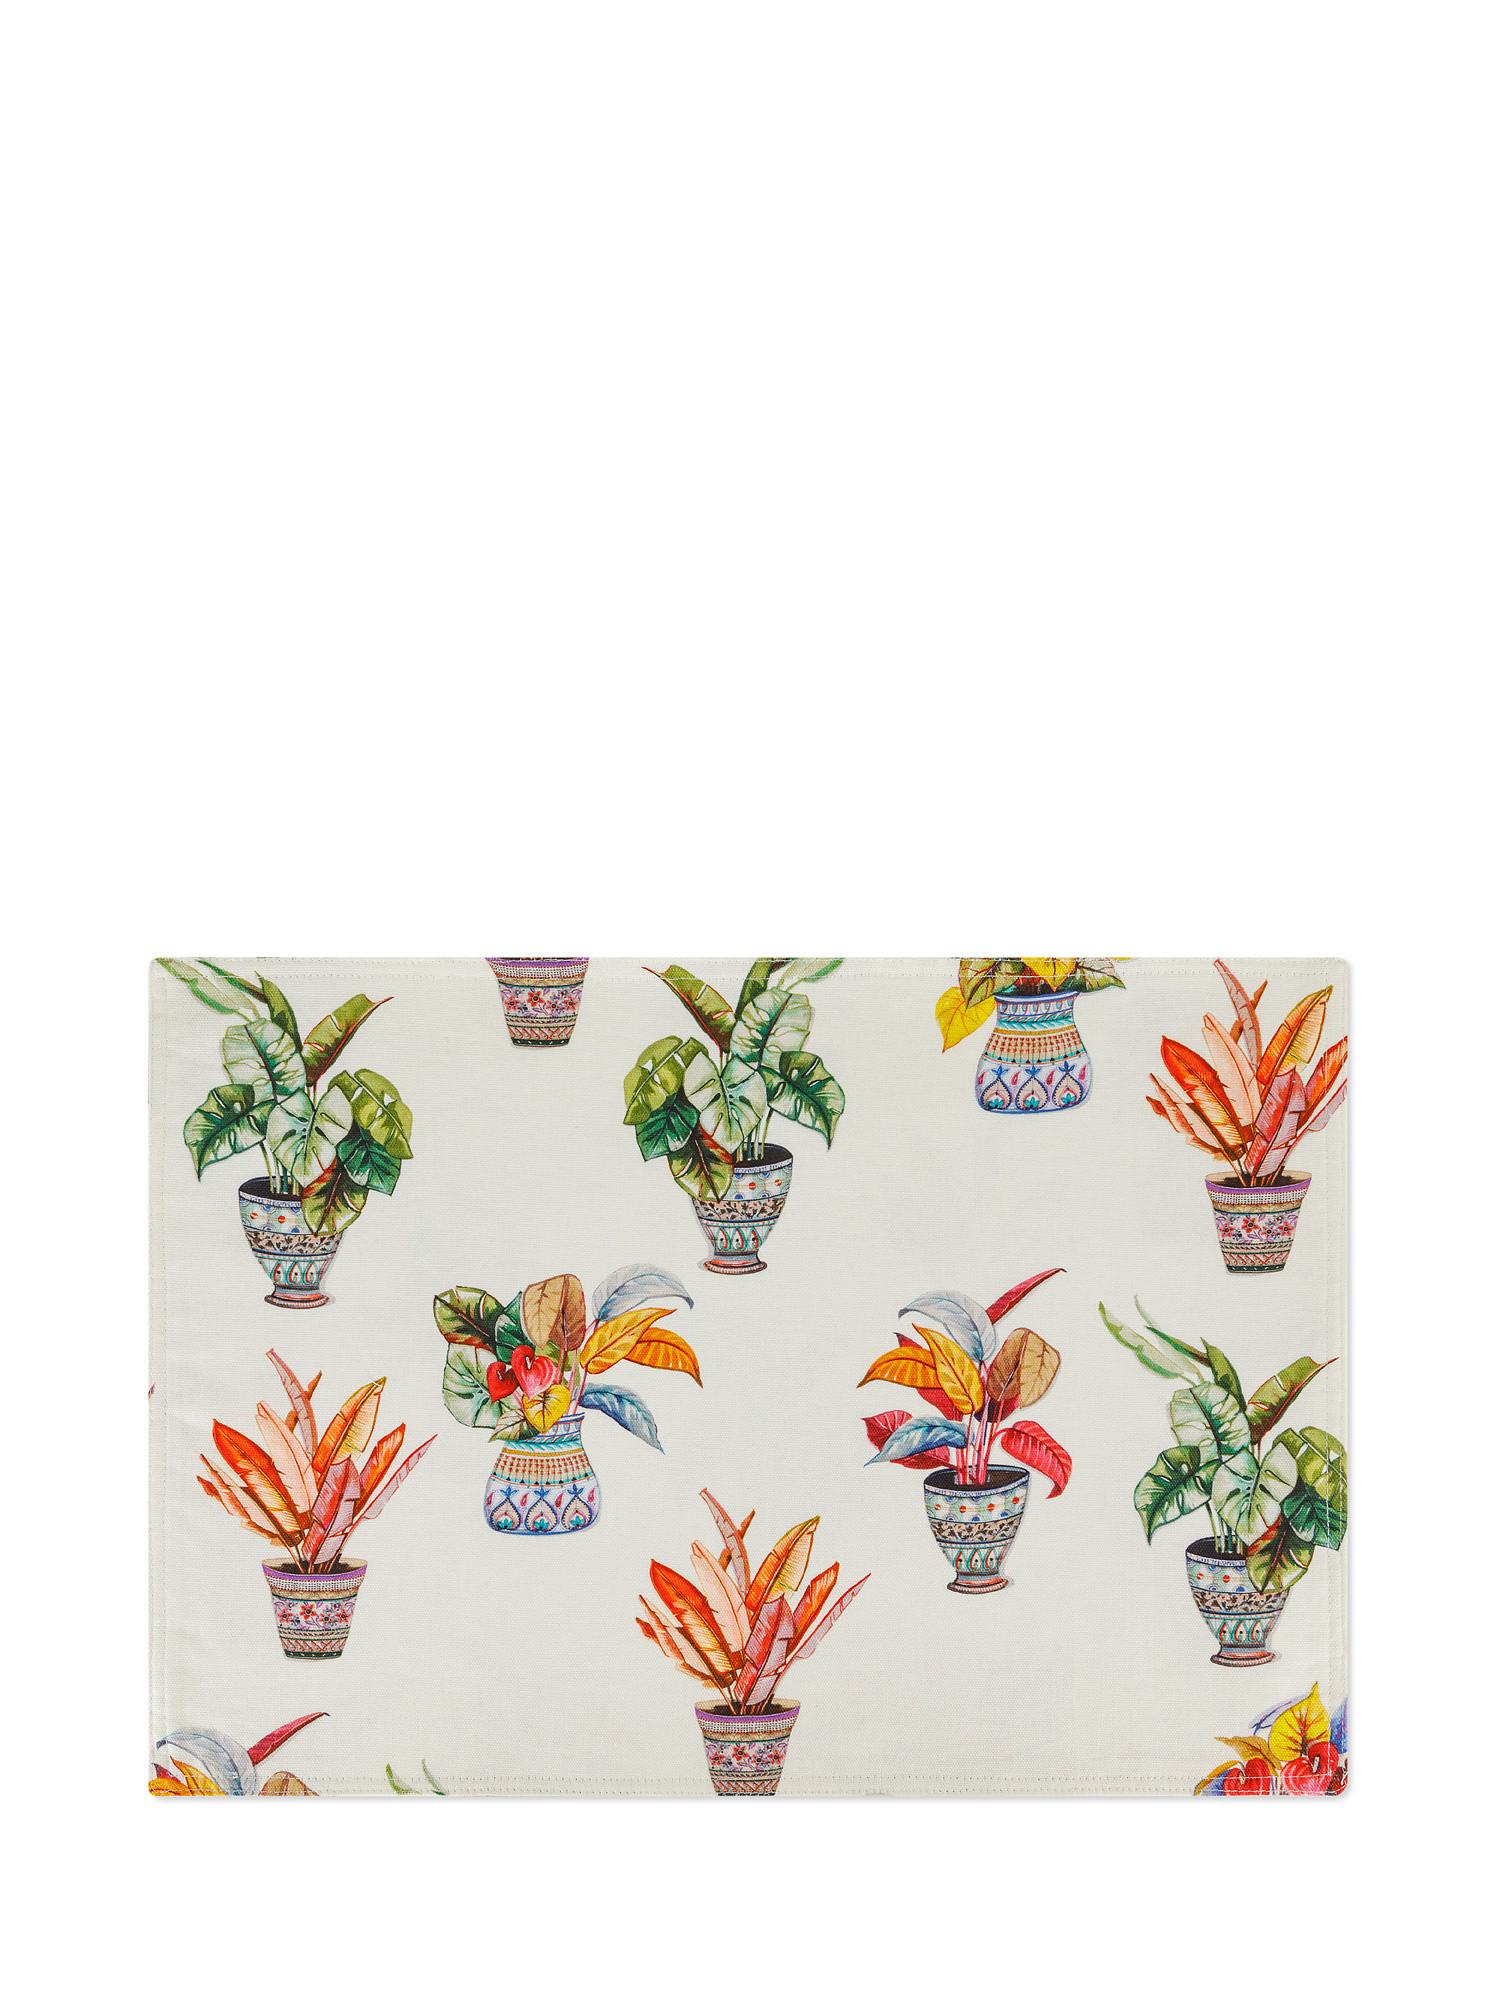 Tovaglietta puro cotone organico stampa vasi, Multicolor, large image number 0